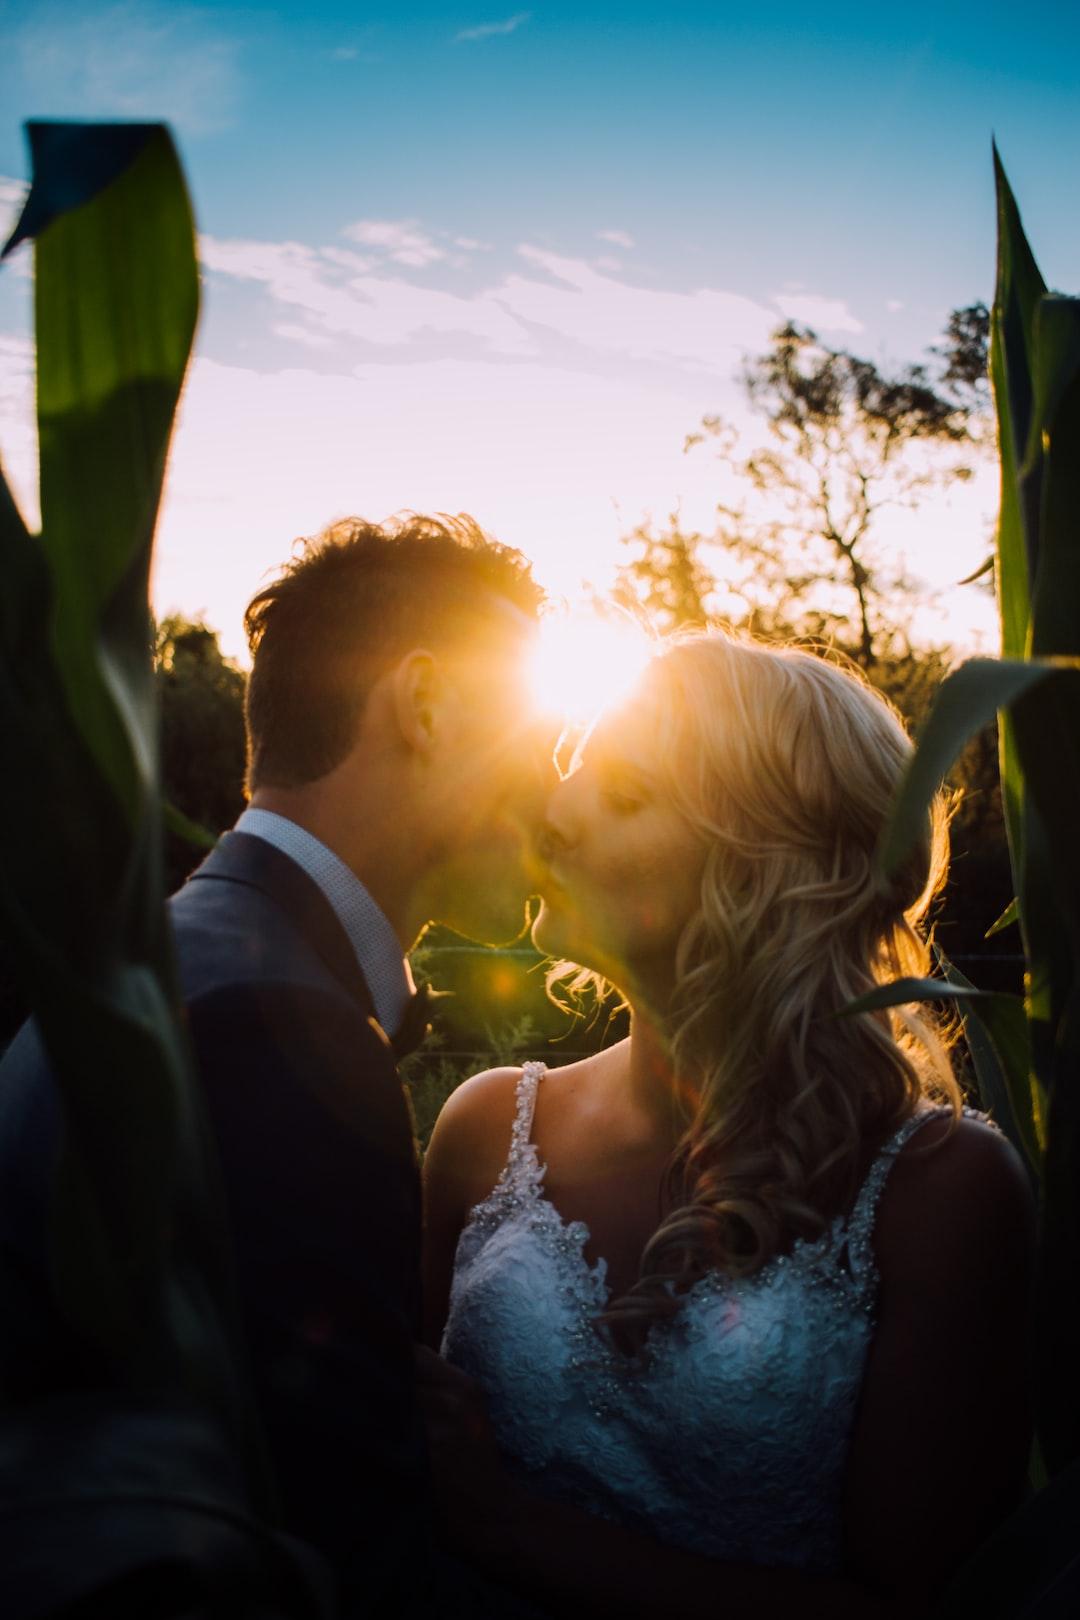 Newlyweds kiss in a cornfield